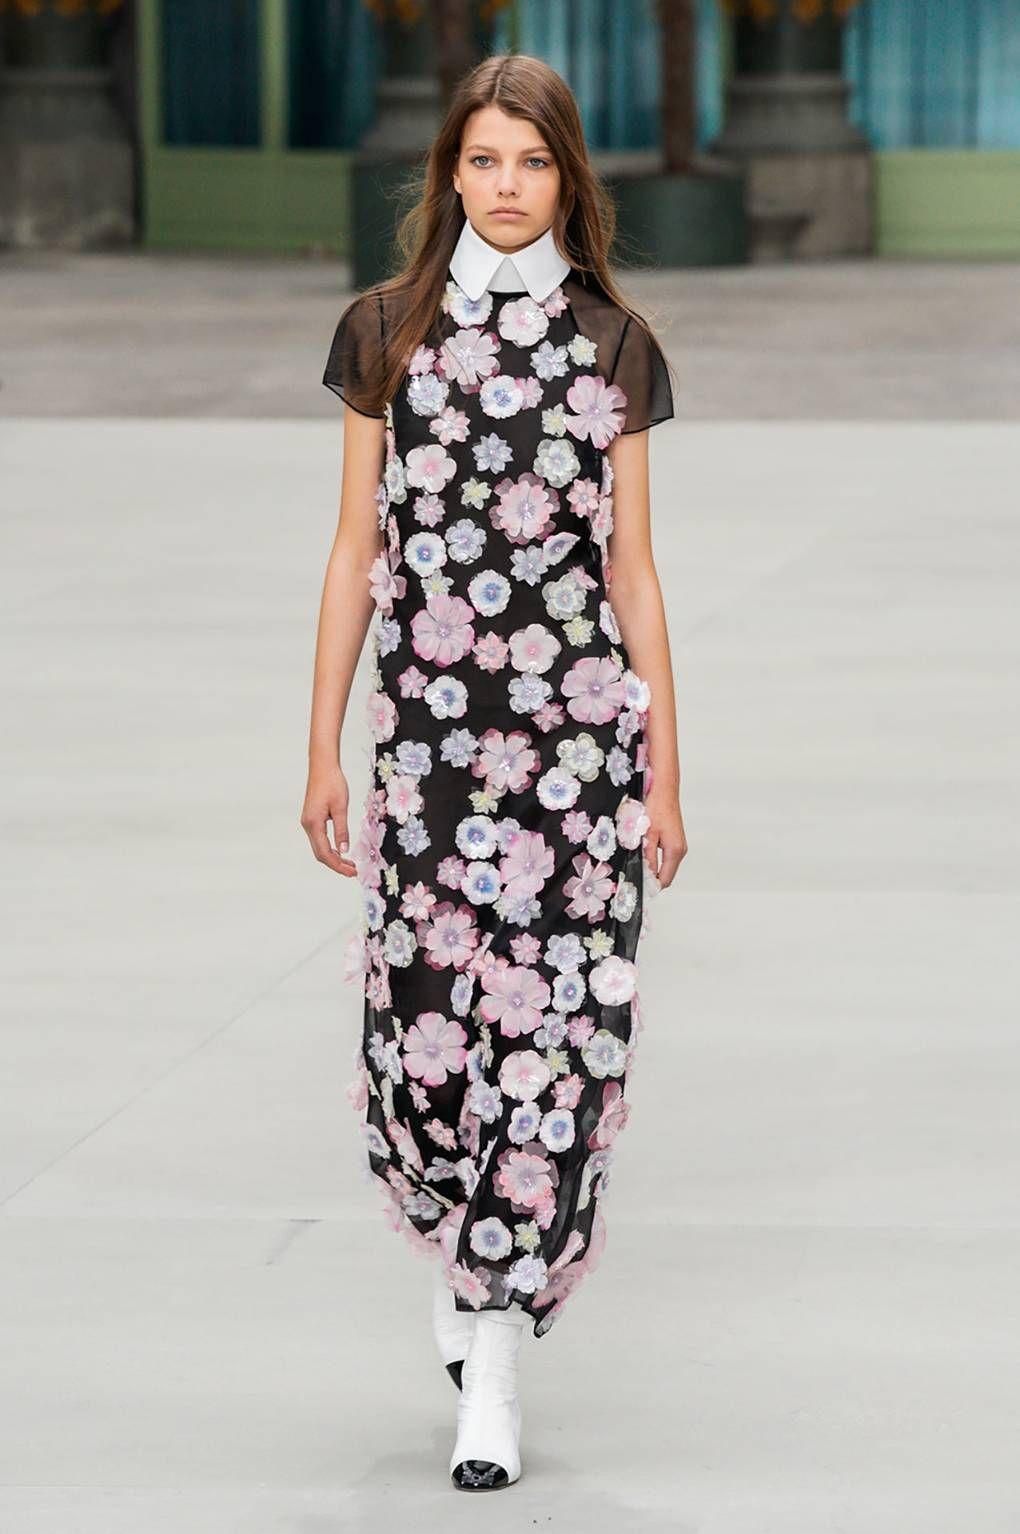 Chanel Spring/Summer 2020 Resort Fashion, Fashion show